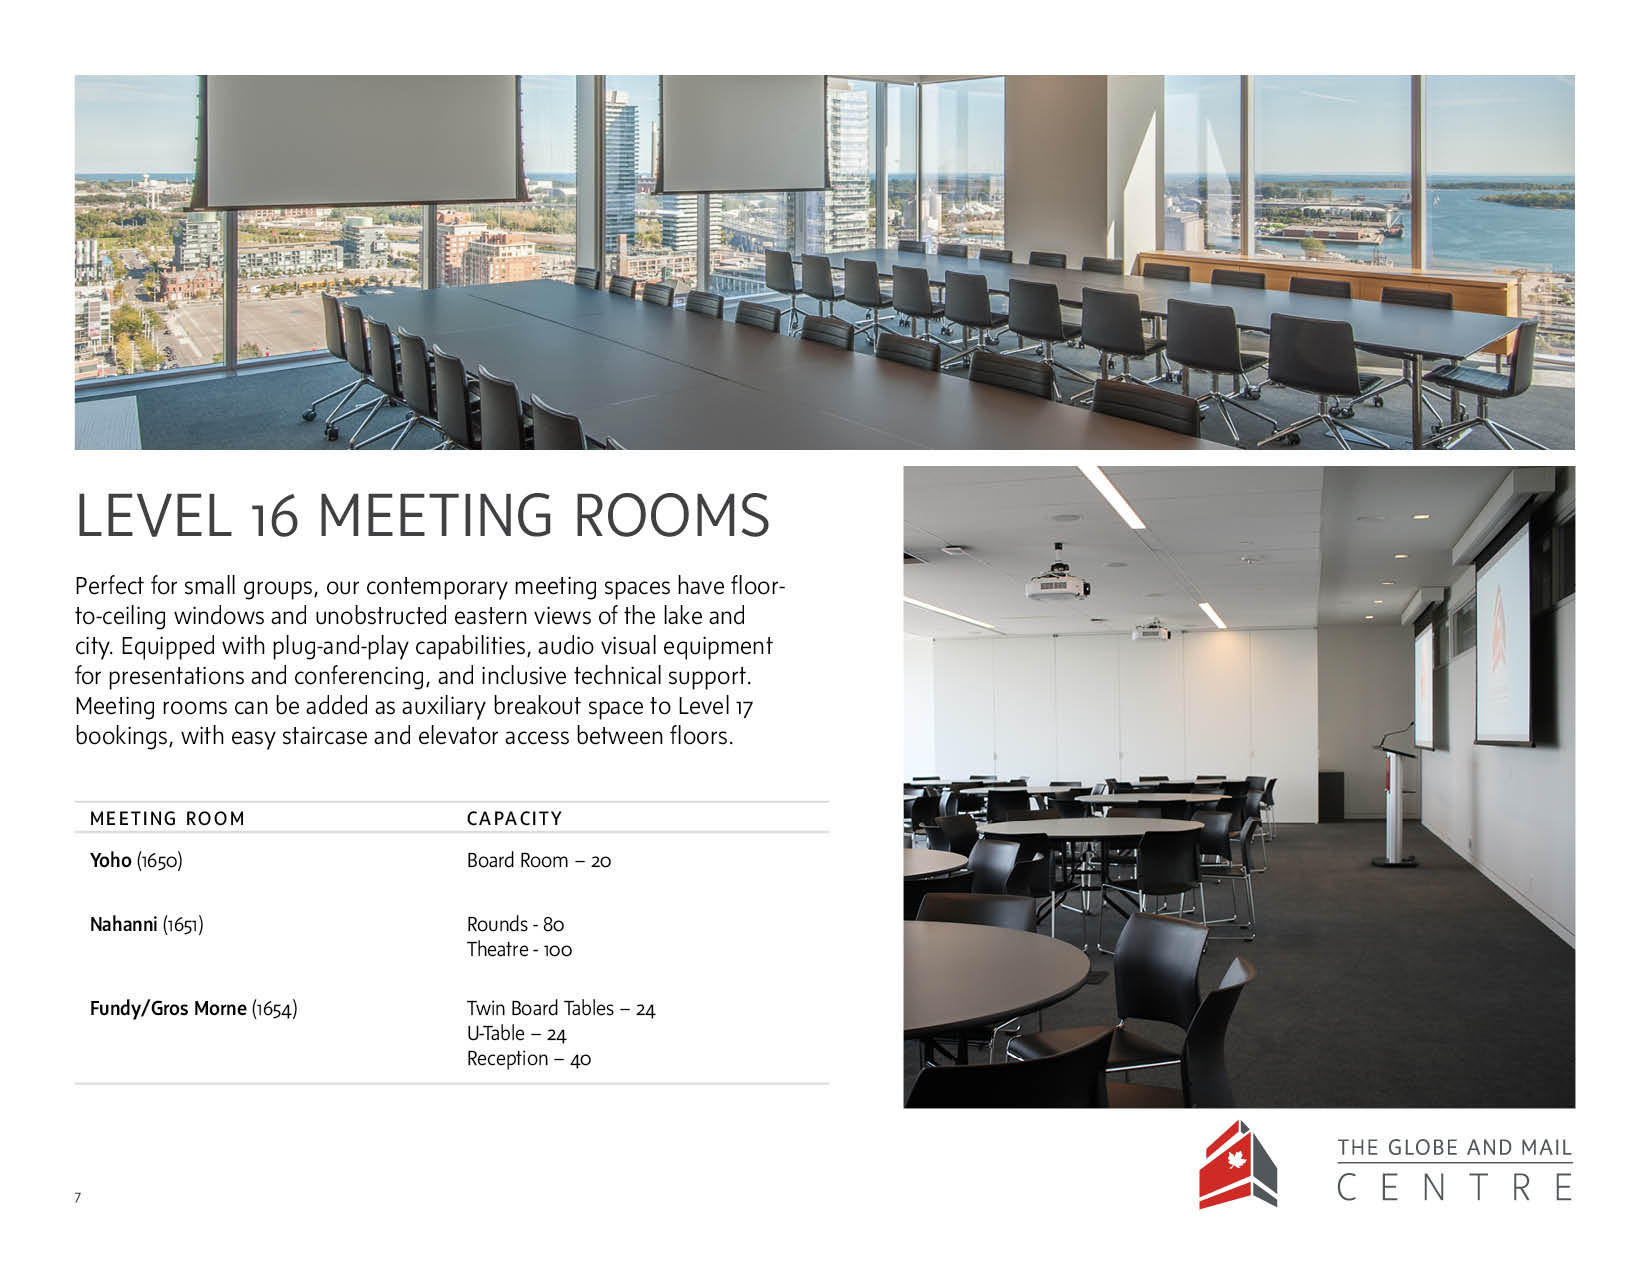 2019-09-01 GAMC Corporate Events7.jpg